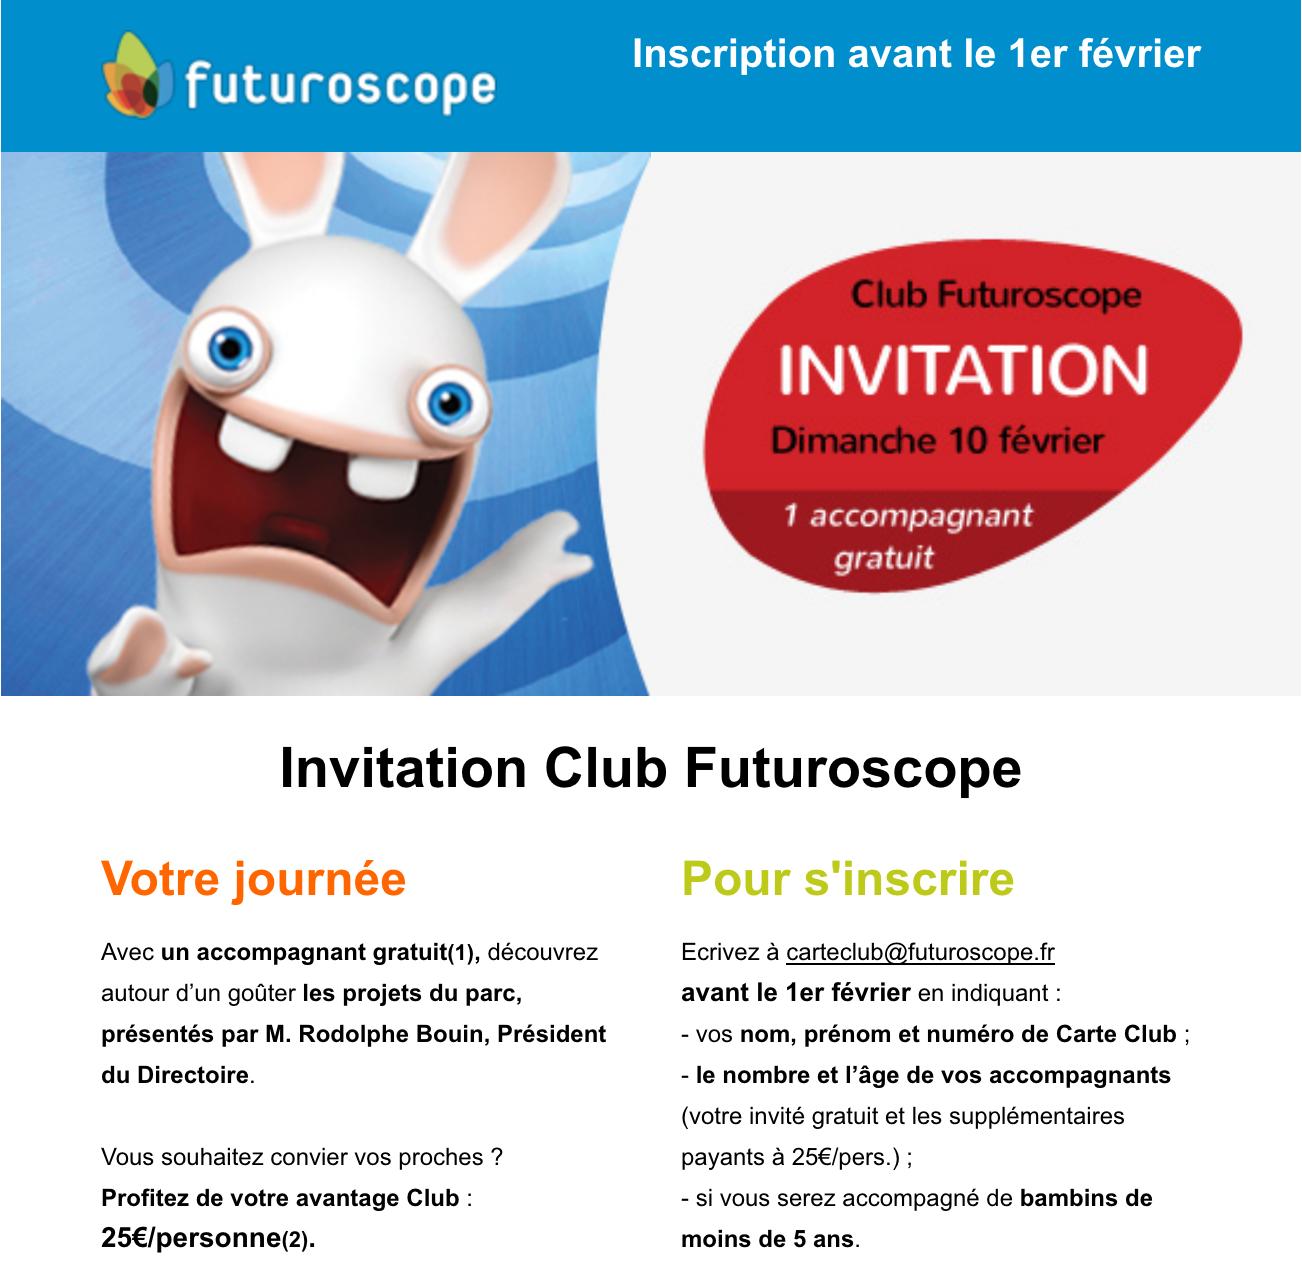 Invitation goûter Club Futuroscope – dimanche 10 février 2019 10h30 Capture-d-e-cran-2019-01-20-a-12-58-06